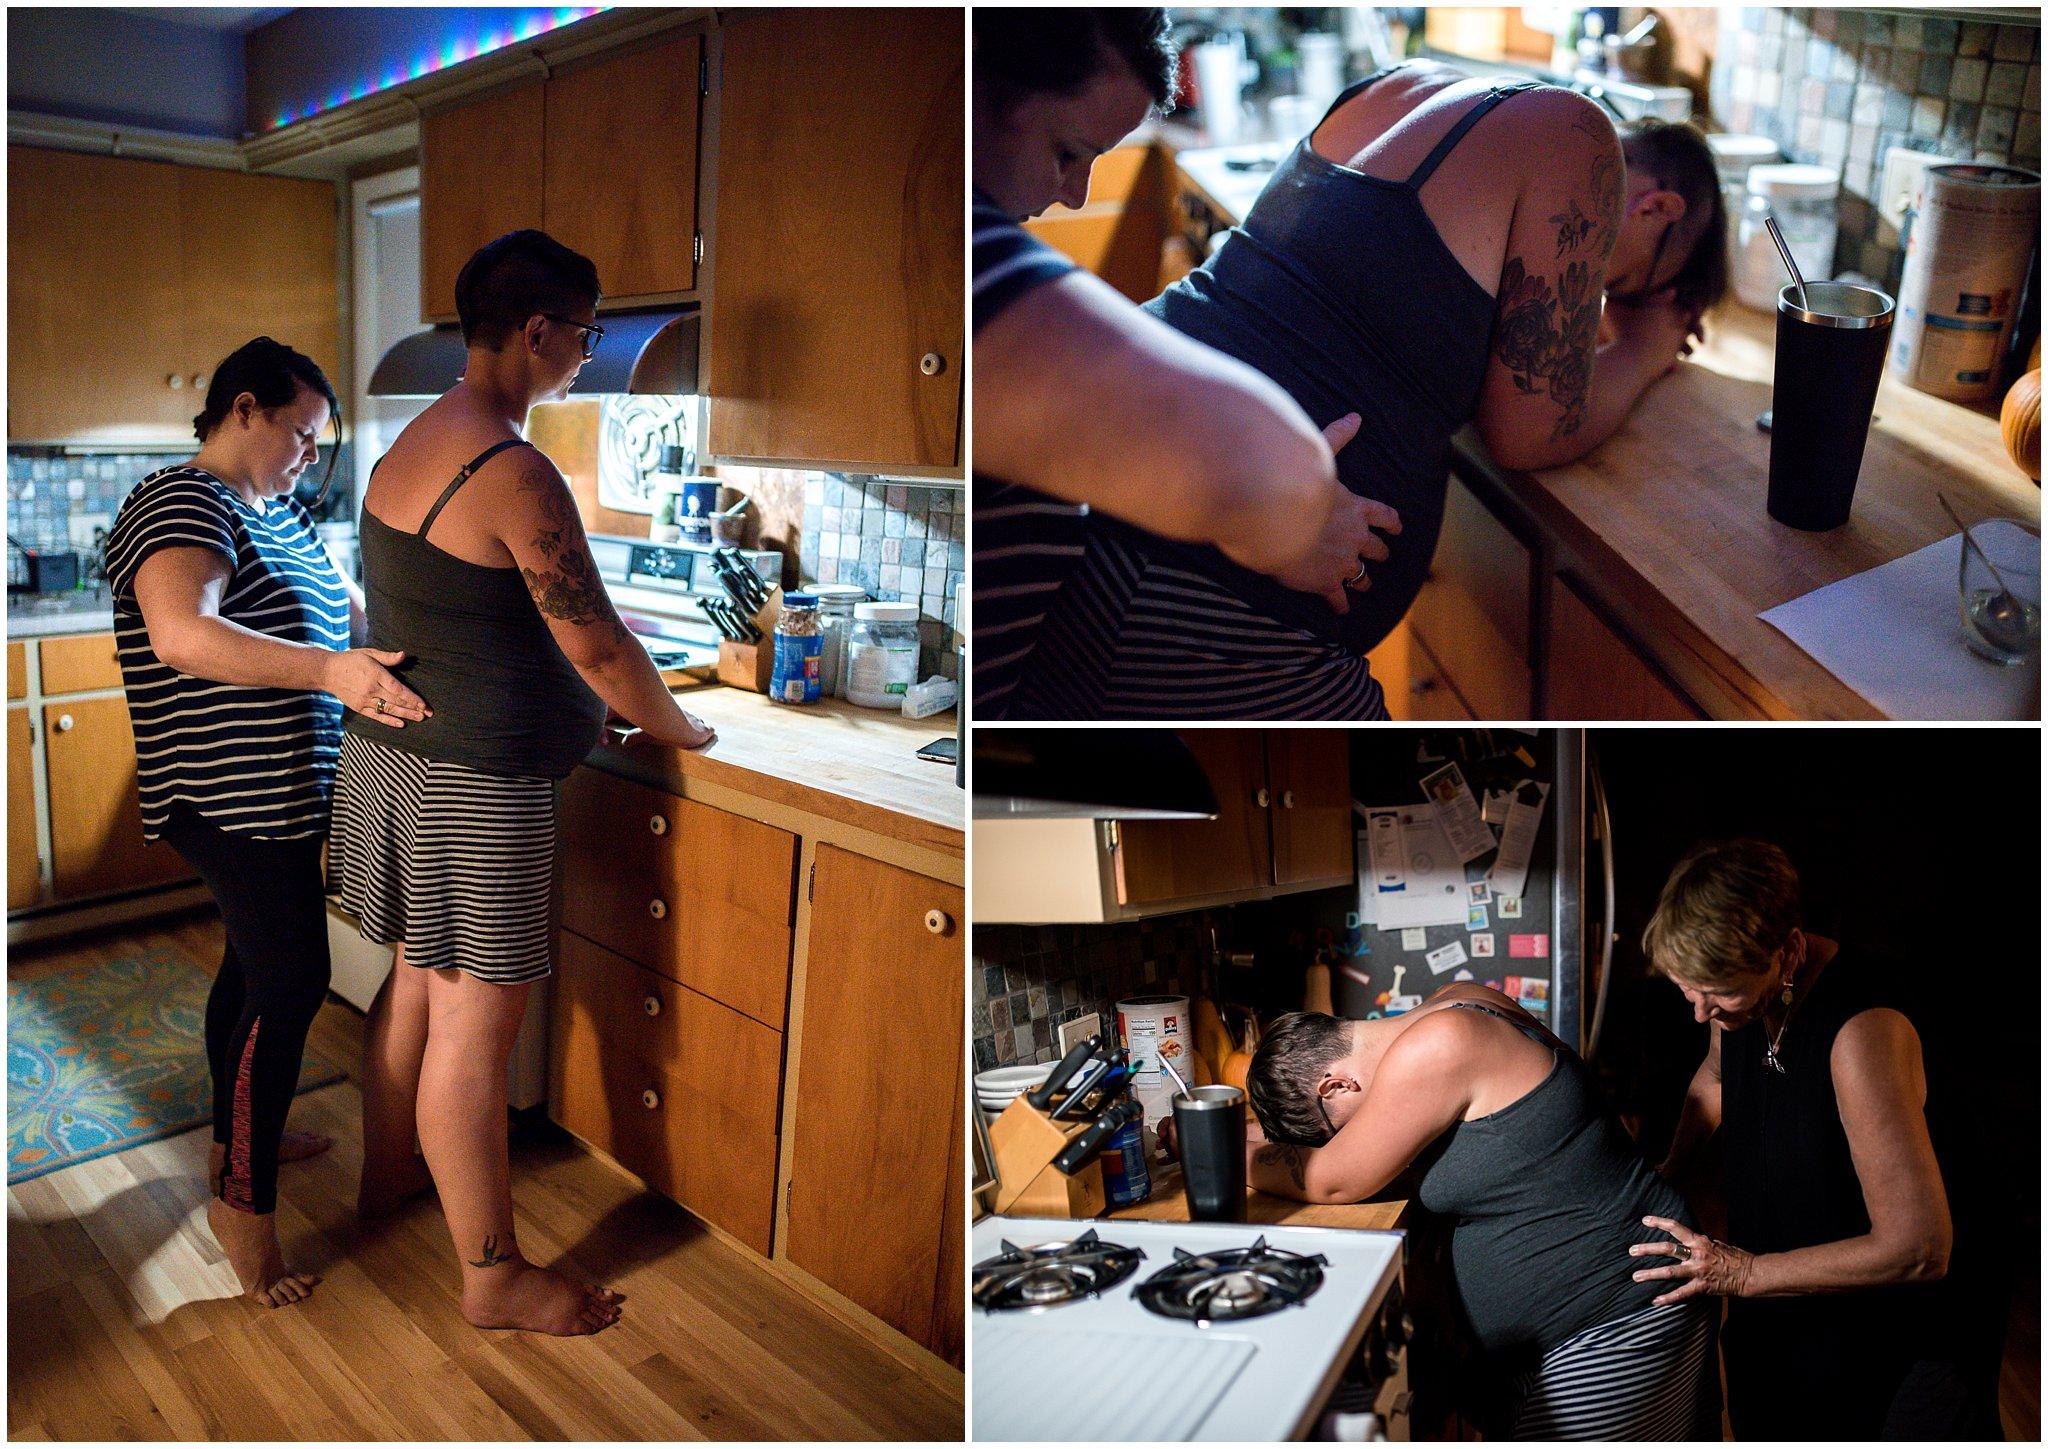 Grand Rapids home birth photographer - Annica Quakenbush - West Michigan birth photography